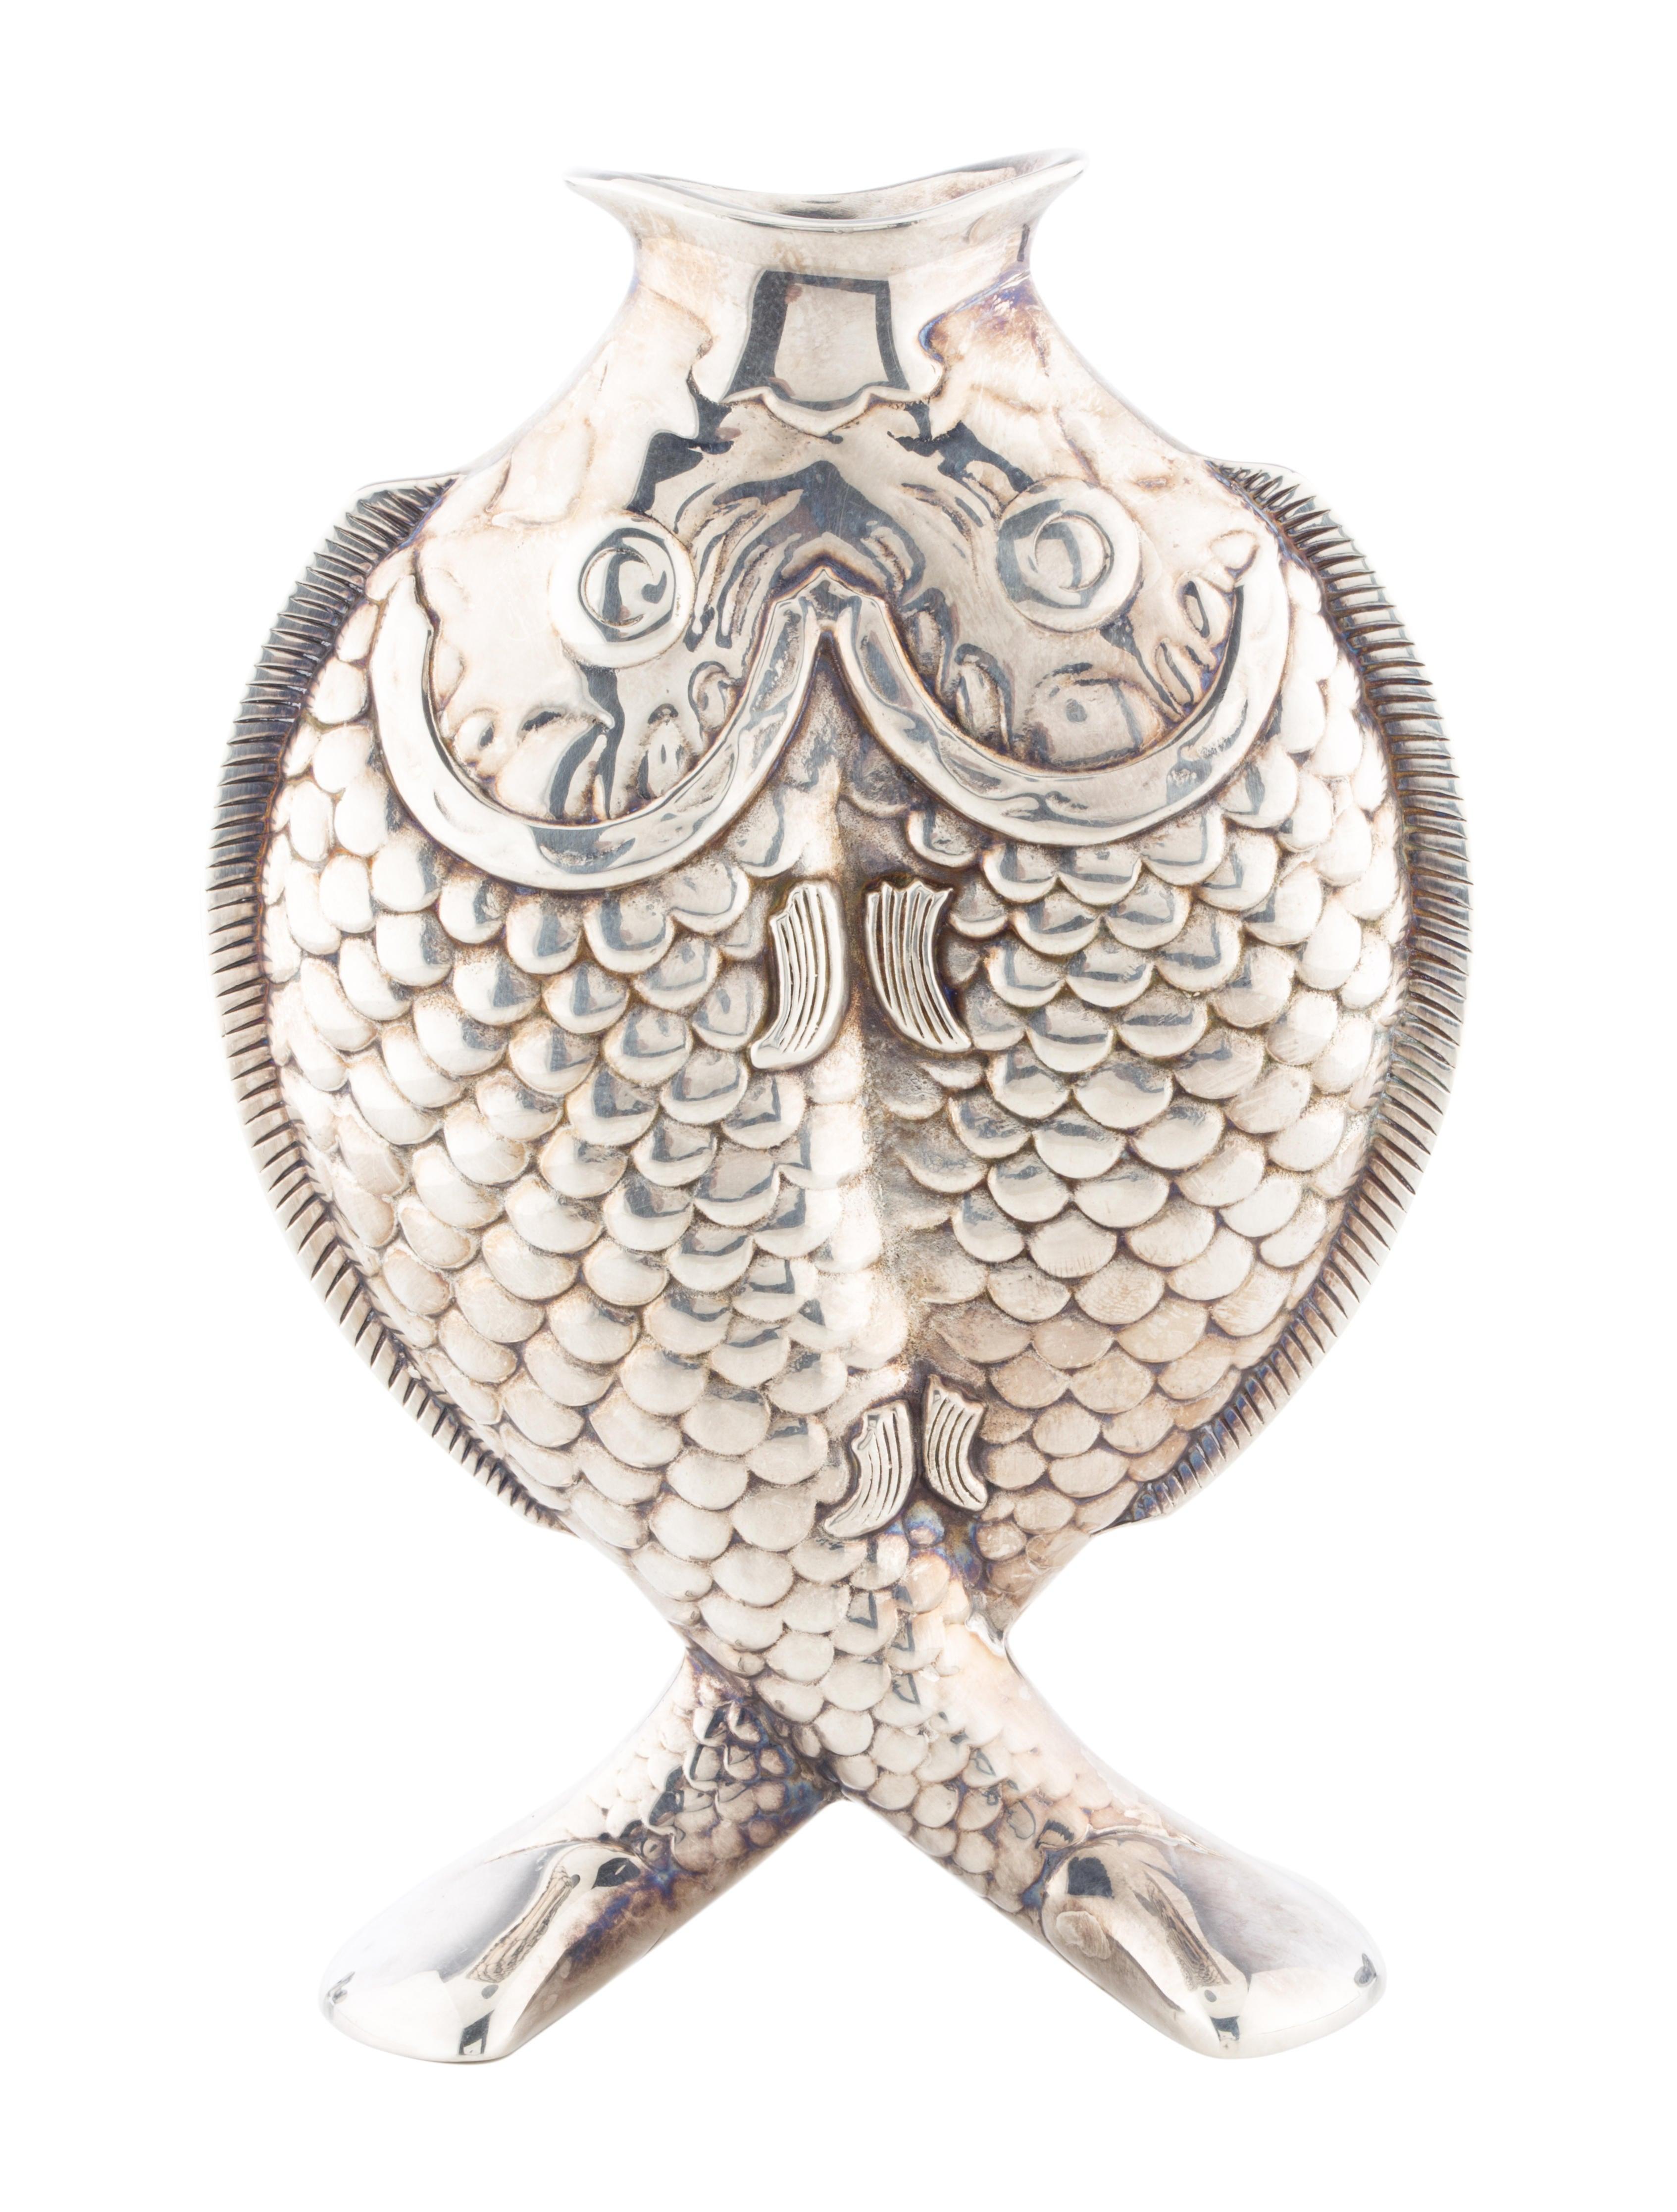 Christofle art nouveau vase decor and accessories for Artistic accents genuine silver decoration